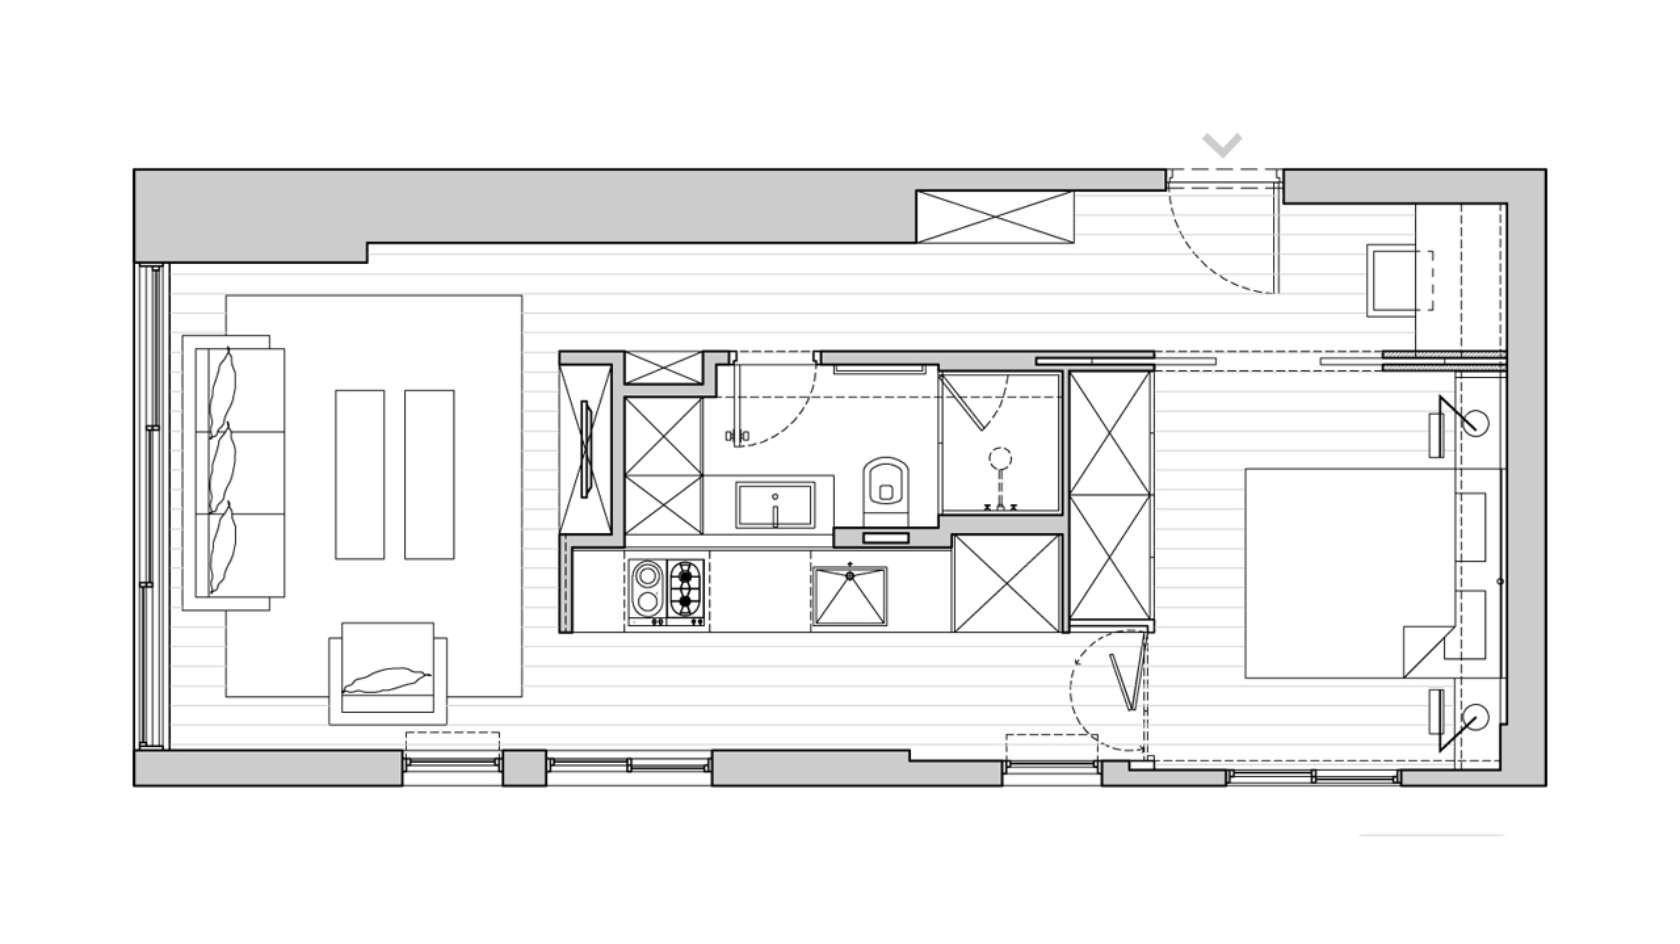 40 M2 430 Sqft Apartment Small Apartment Plans Small Apartment Floor Plans Apartment Floor Plans